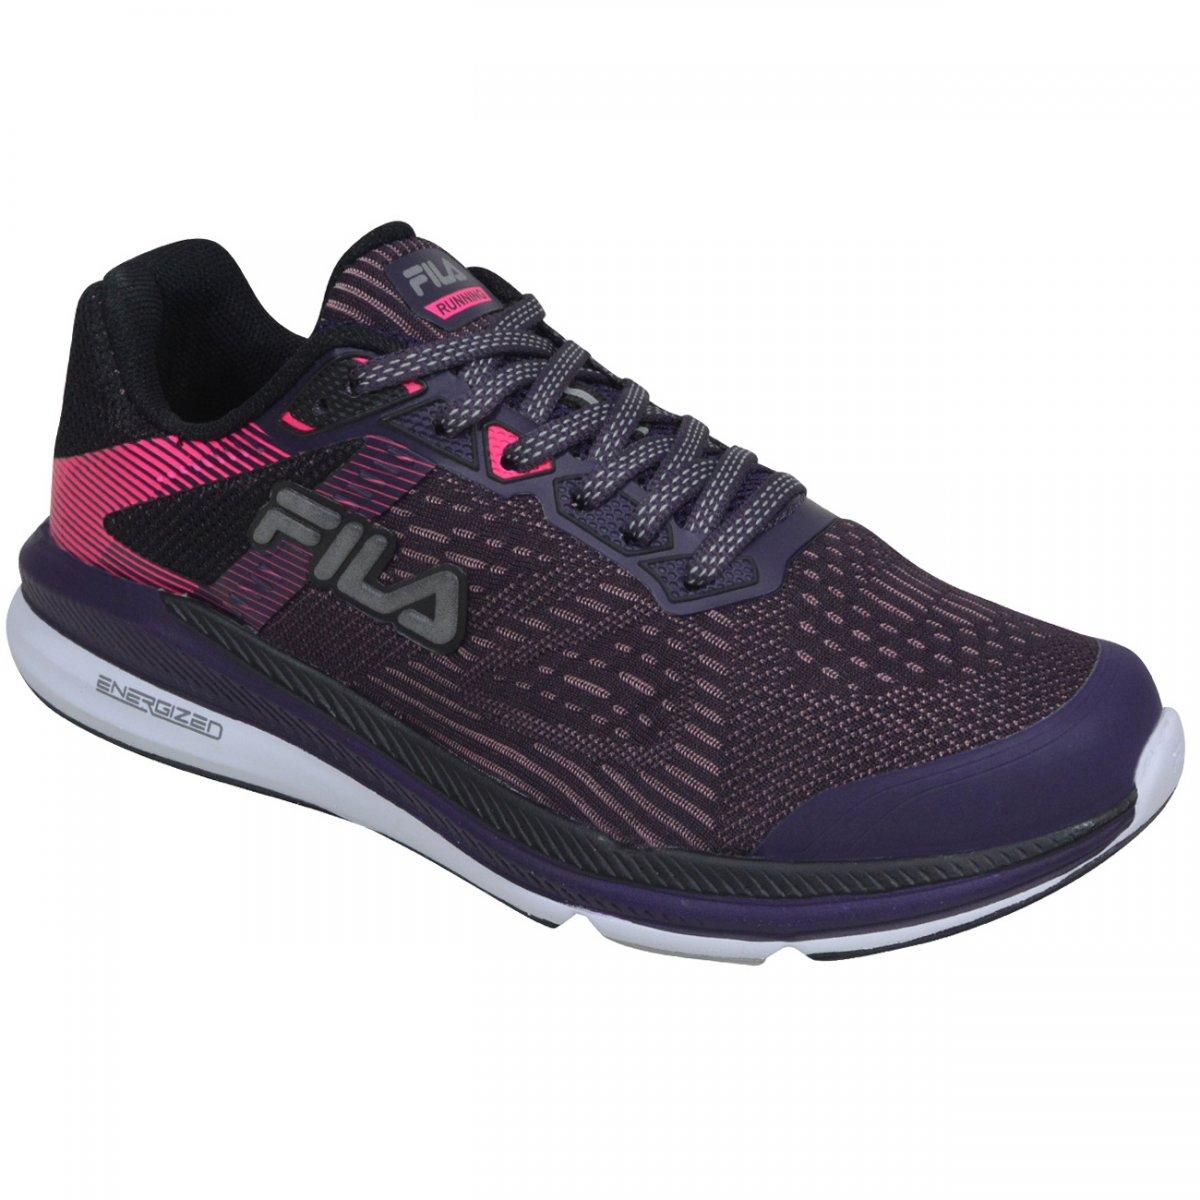 38e1ad2827 Tenis Fila FR Trainer Energized 2.0 802381 - Uva rosa preto - Chuteira  Nike